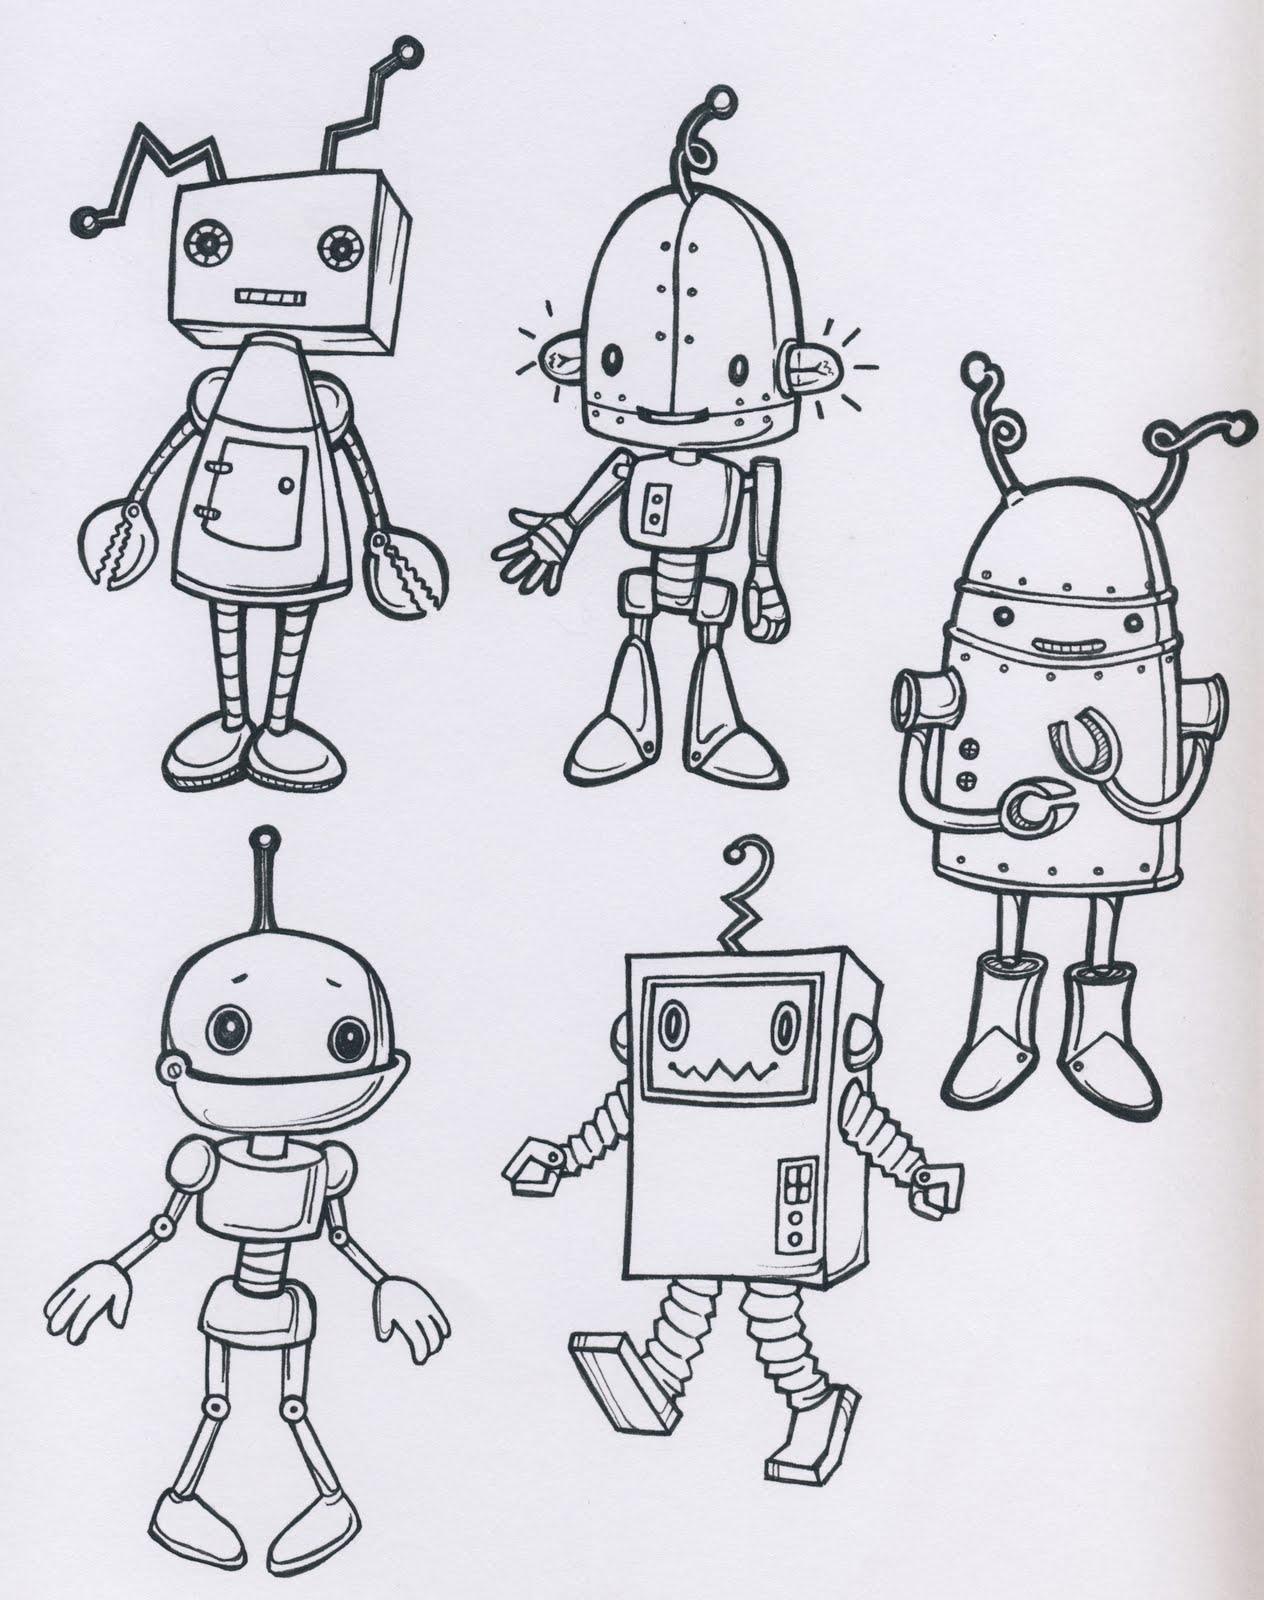 Drawn robot Robots theme normal That's Nursery